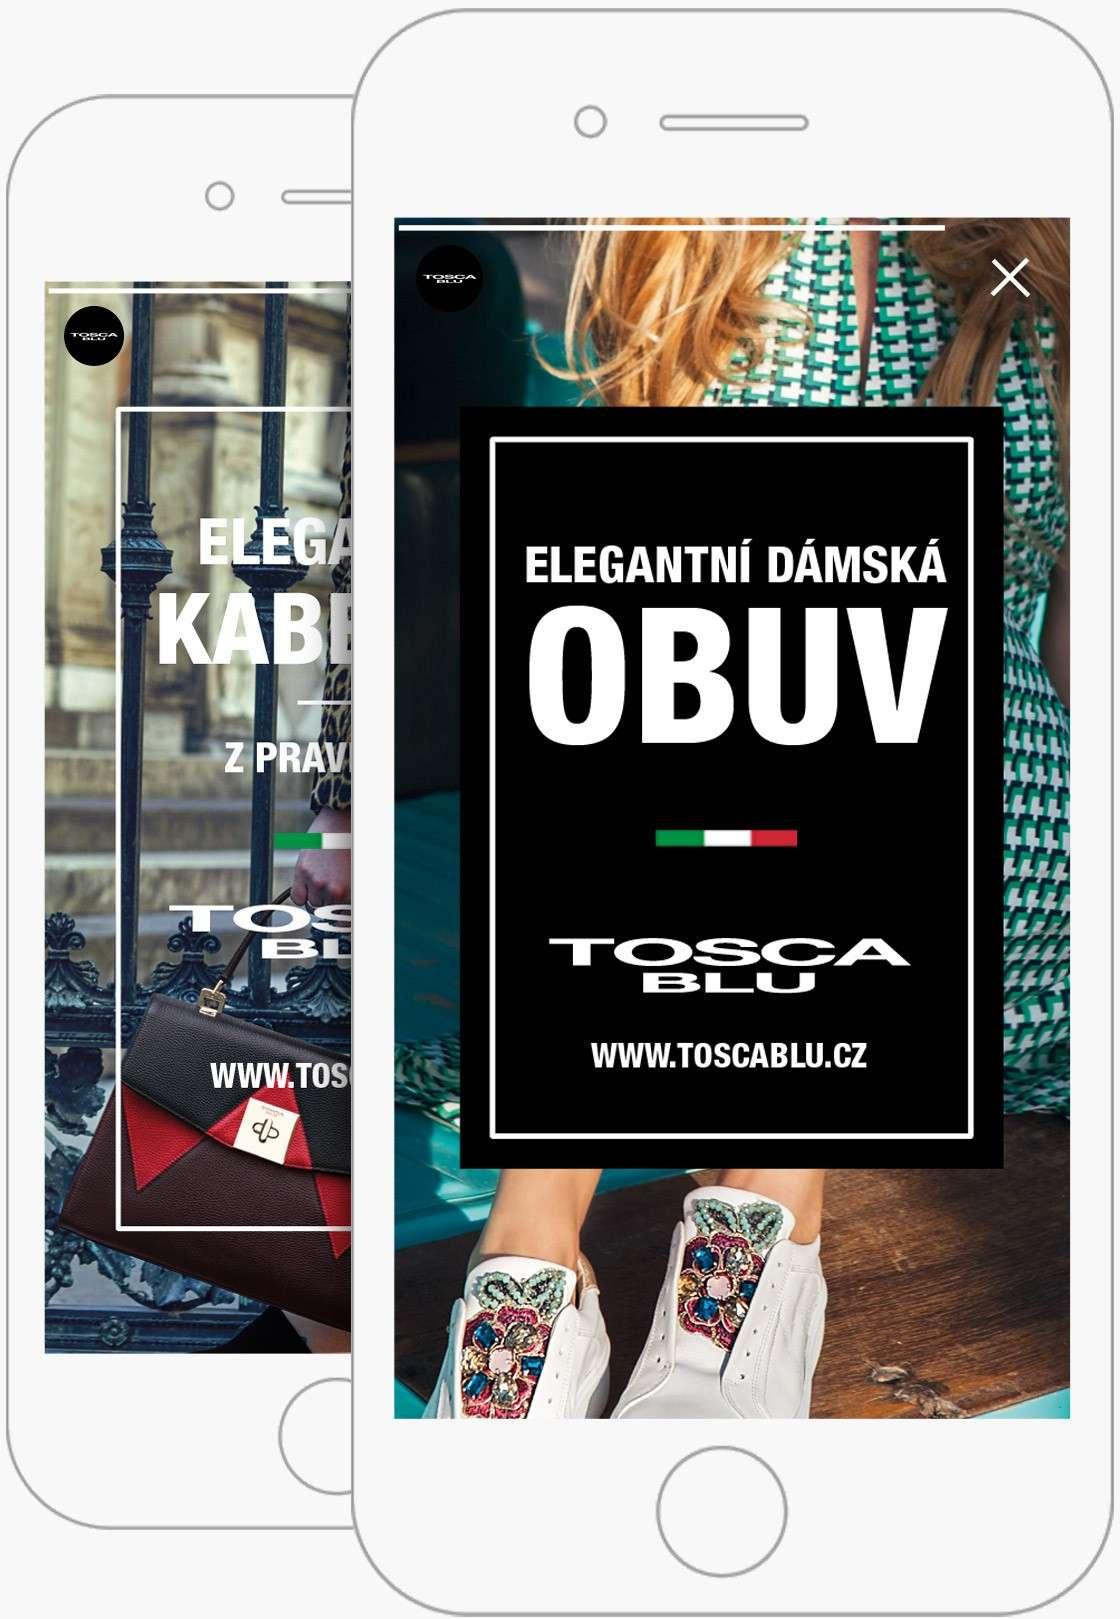 clubadvisor_reference_tosca-blu_on-line-marketing_instagram